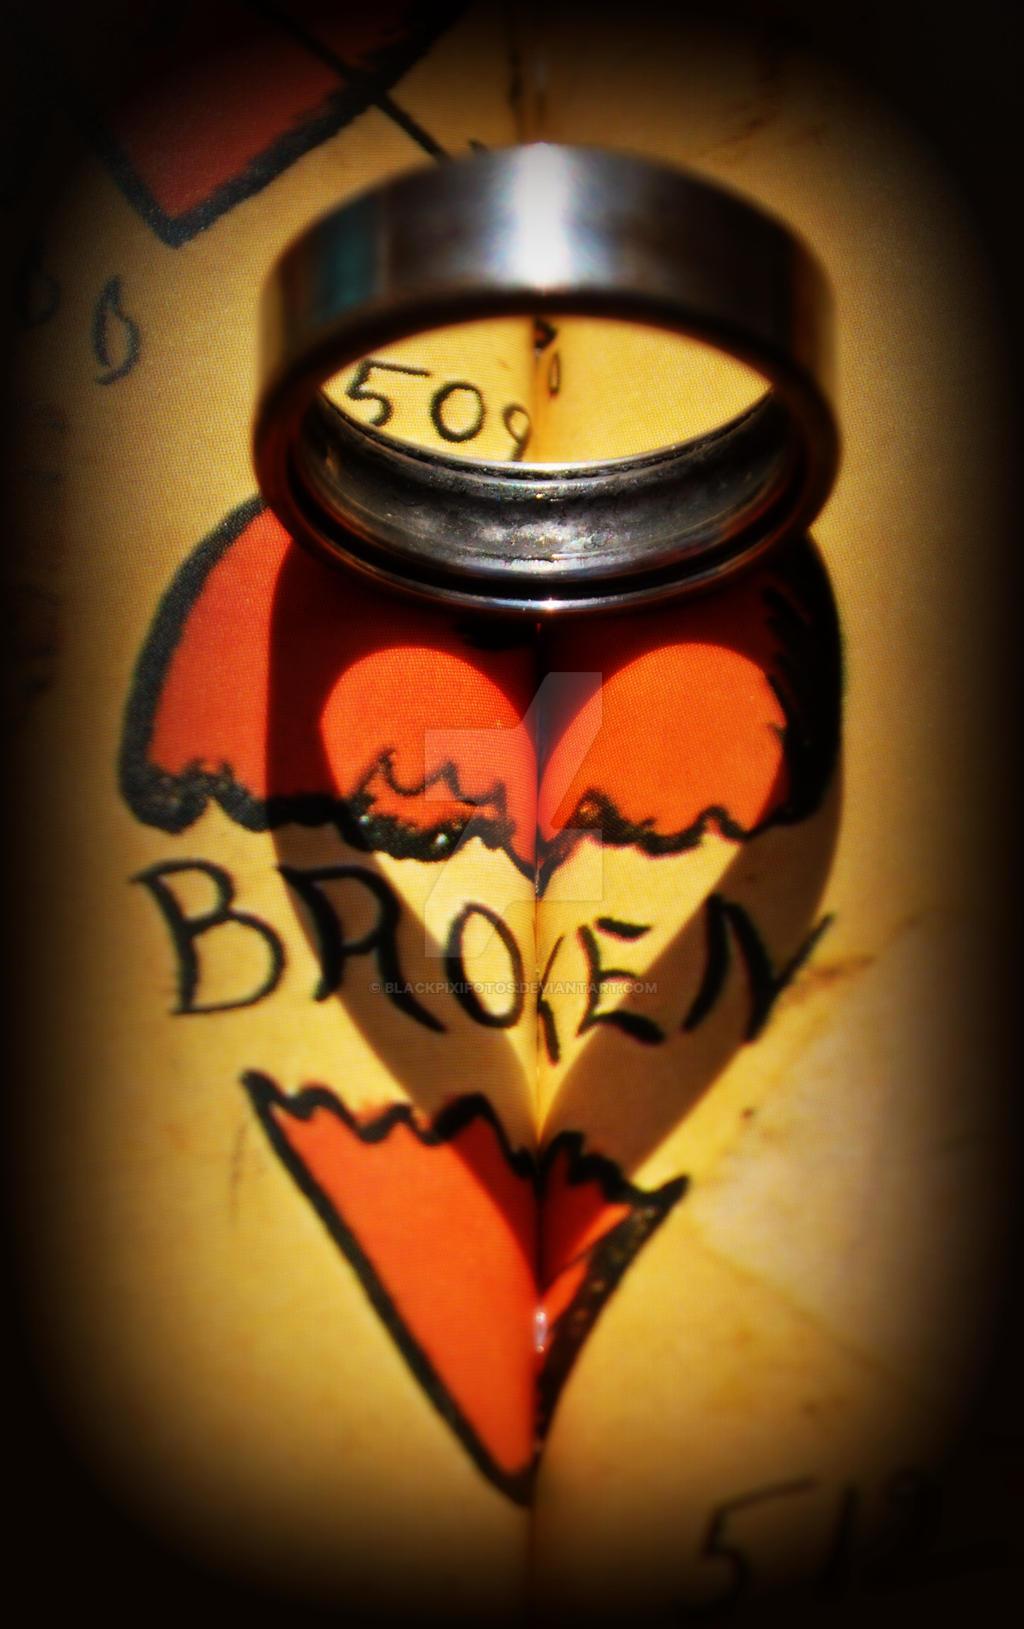 Too Many Broken Hearts by blackpixifotos